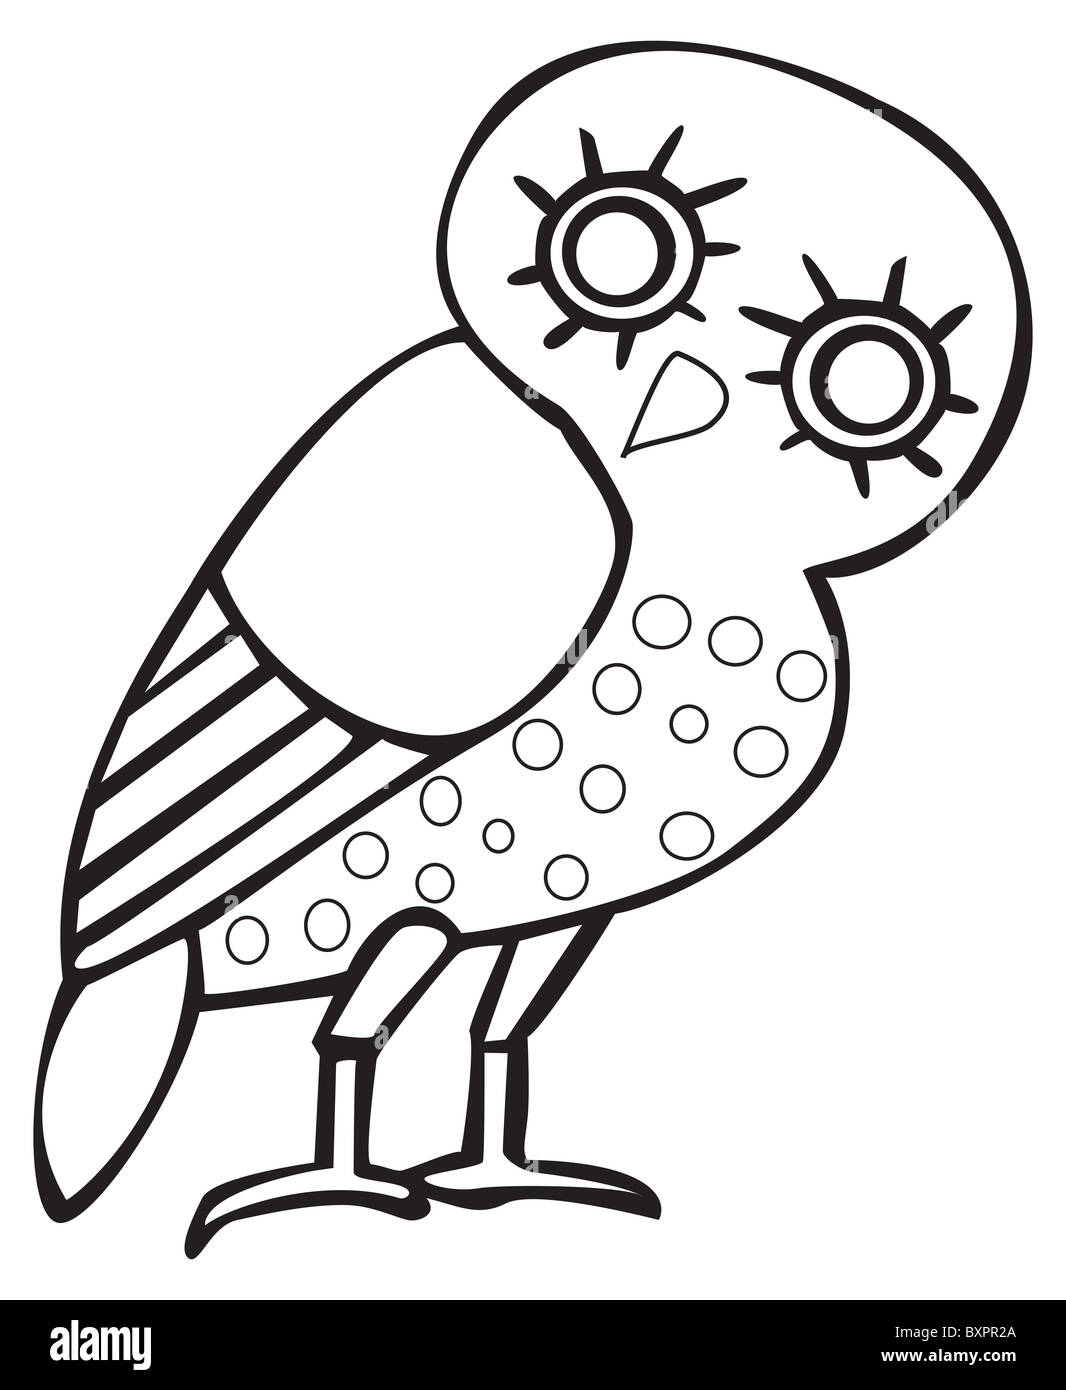 Greek owl sign, symbol, for tattoo or artwork, vector. - Stock Image